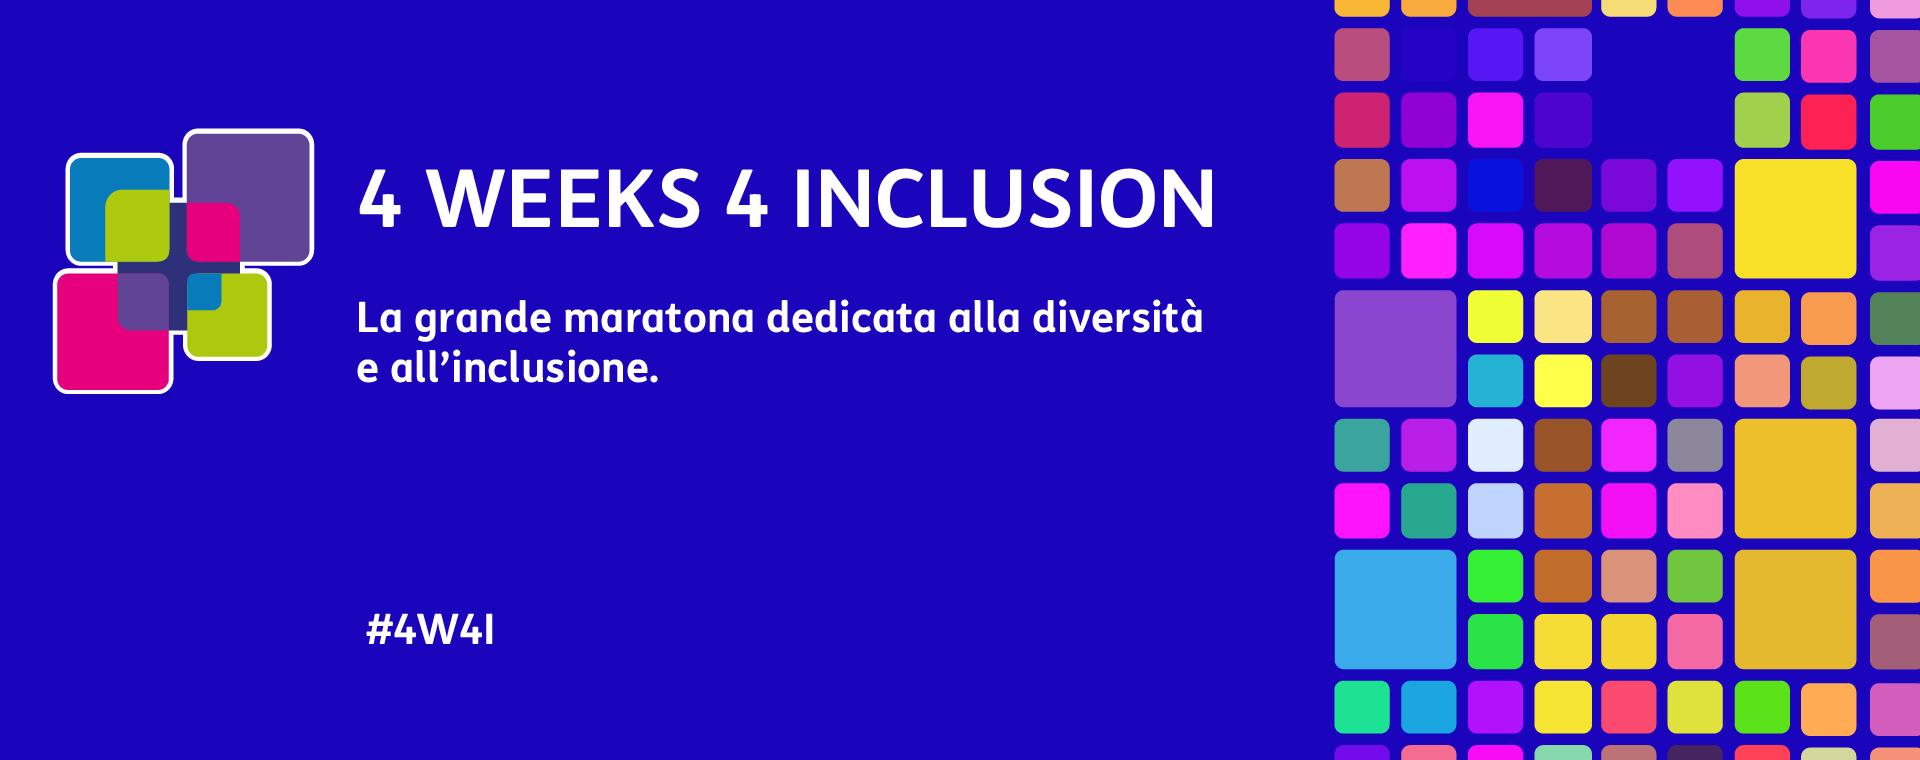 4 Weeks 4 Inclusion – Storie di donne, di scienza e di vita